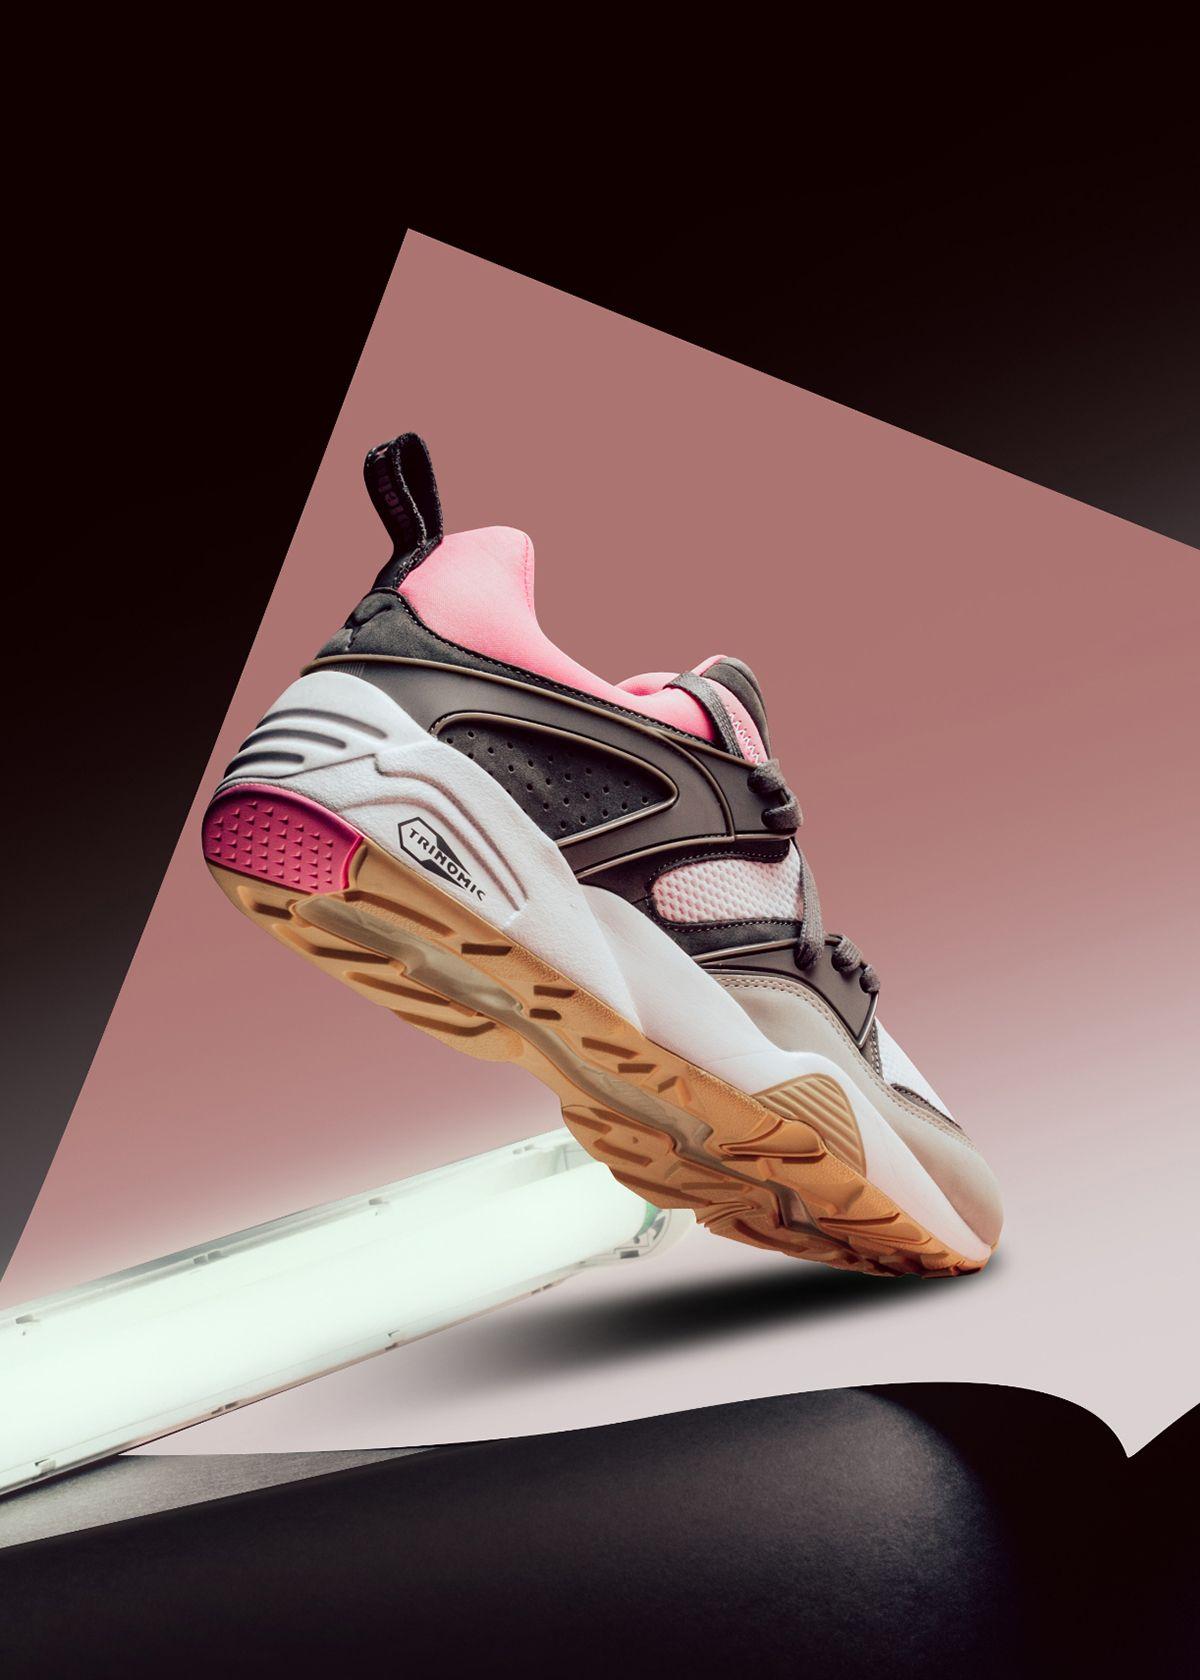 Puma x Solebox 'Champagne Pack' | Chaussure